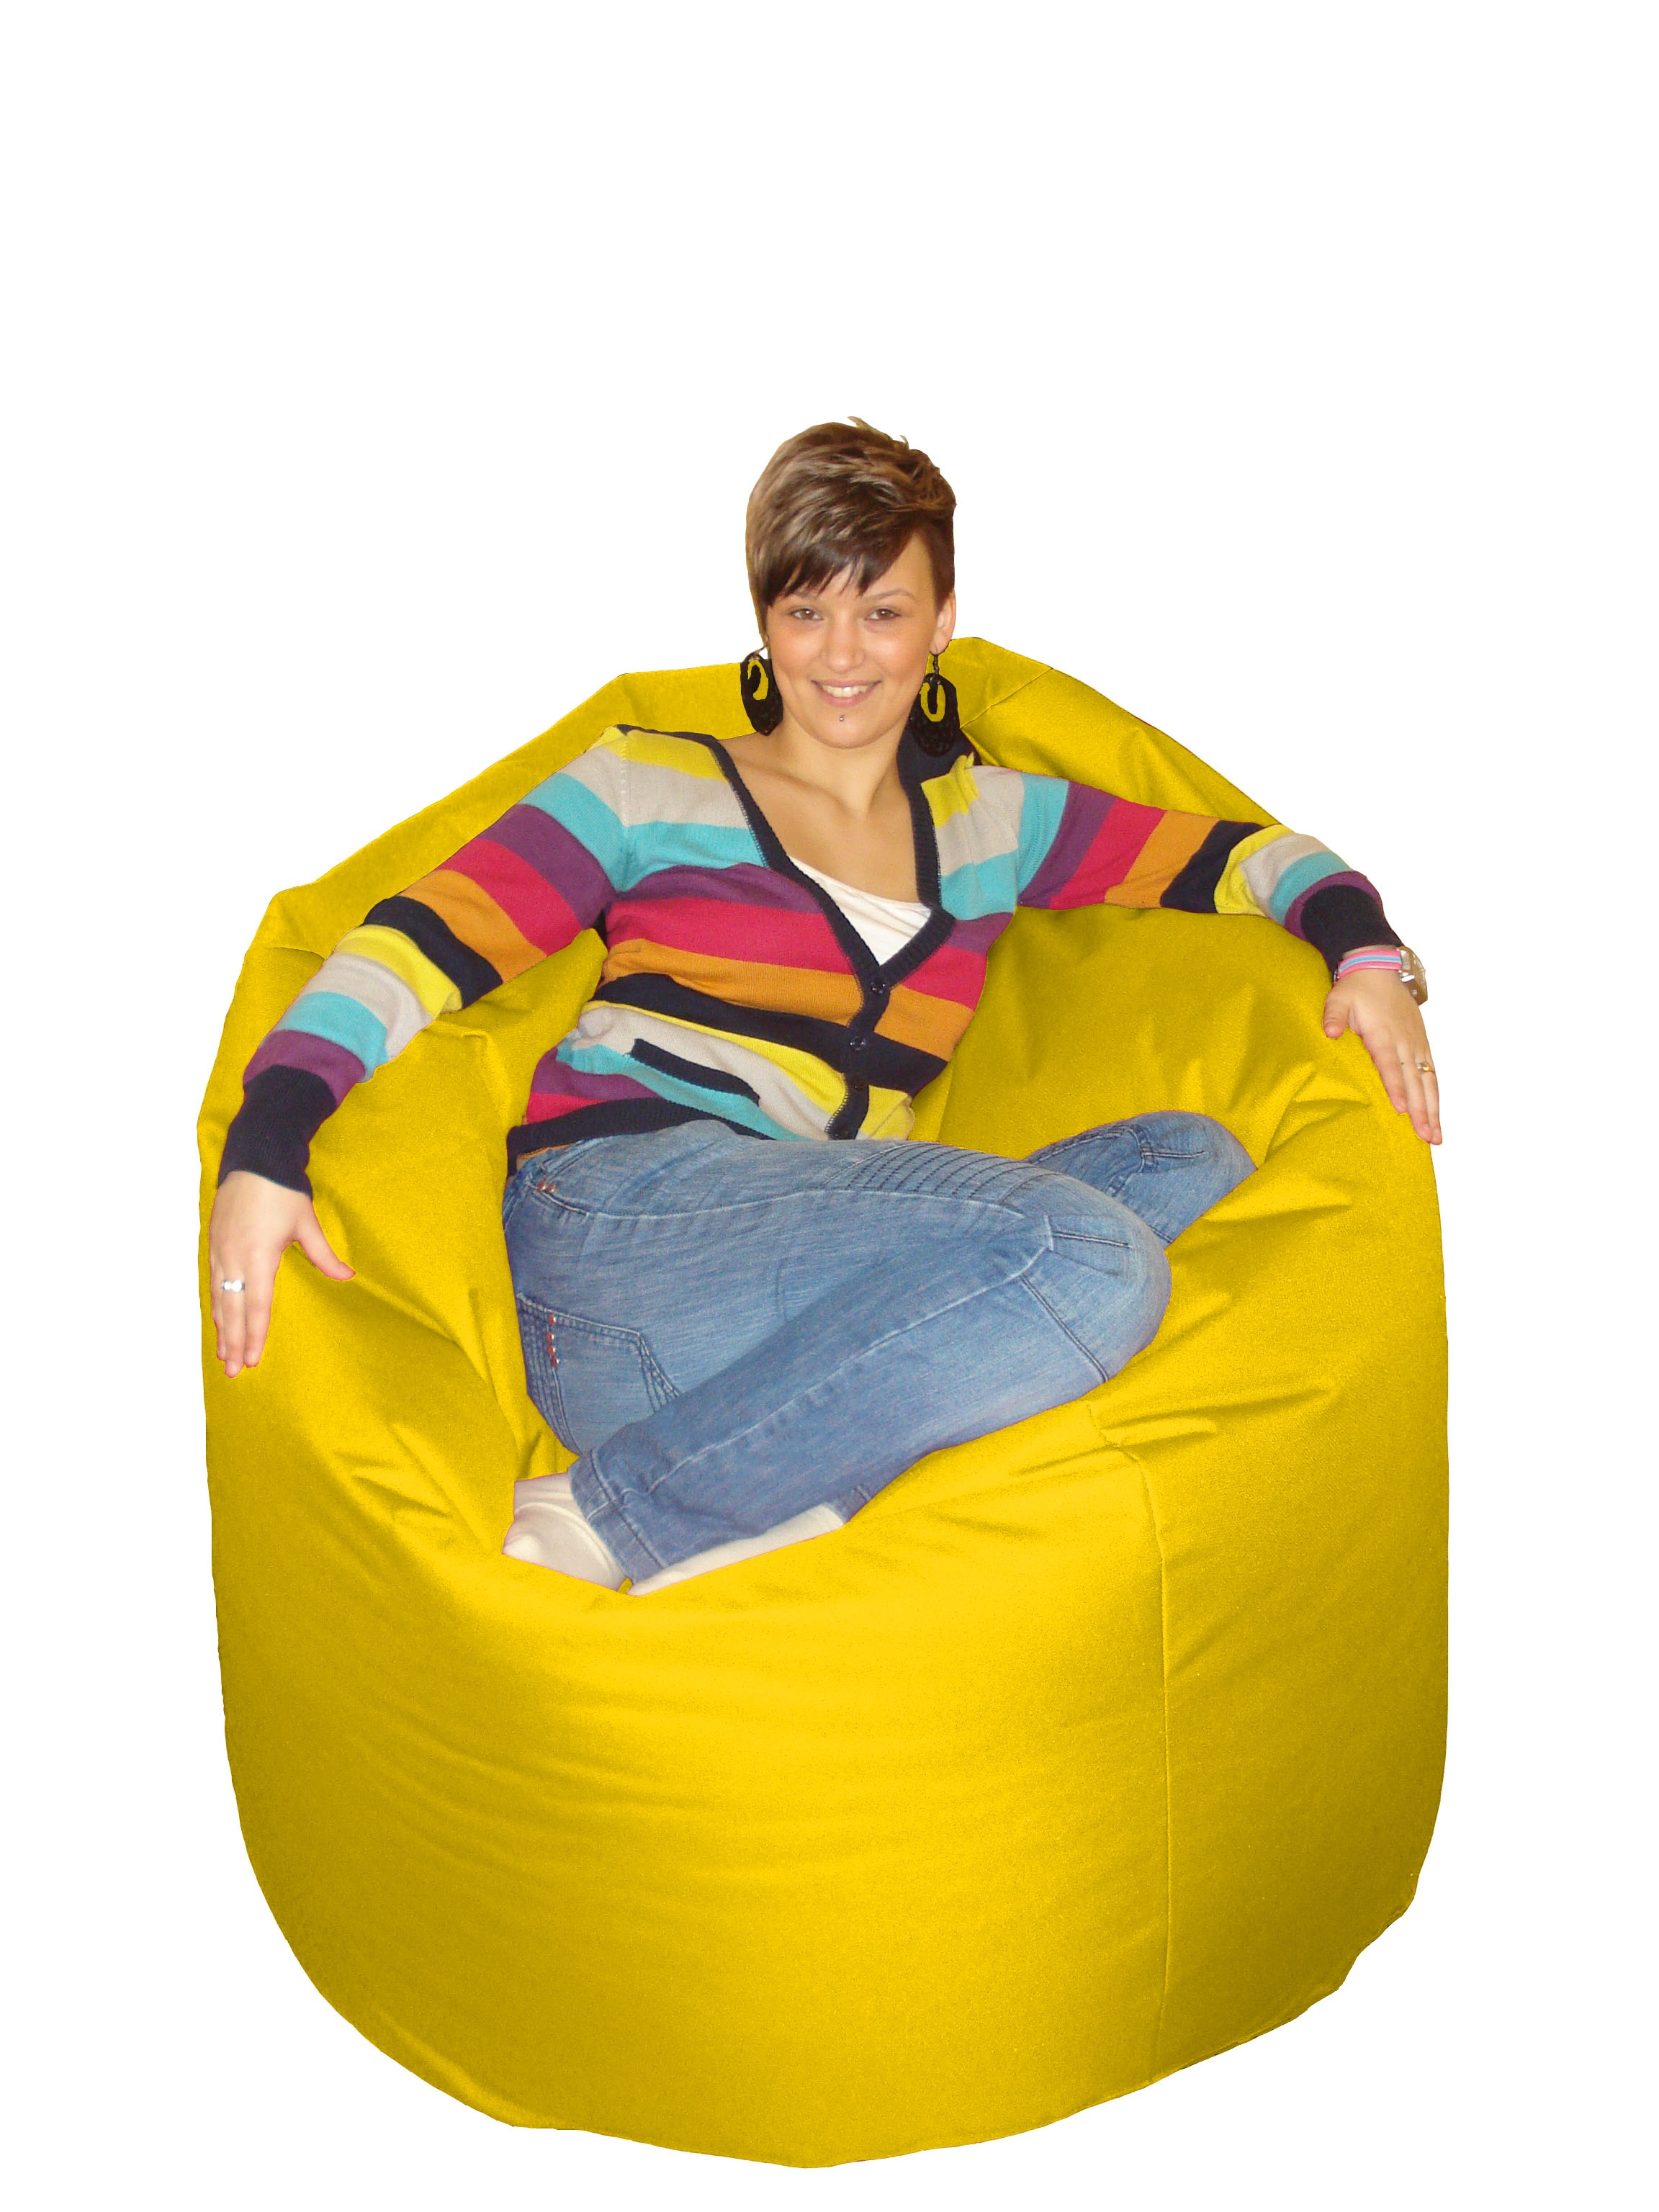 Sedací hruška Cool žlutá (žlutá 60103)